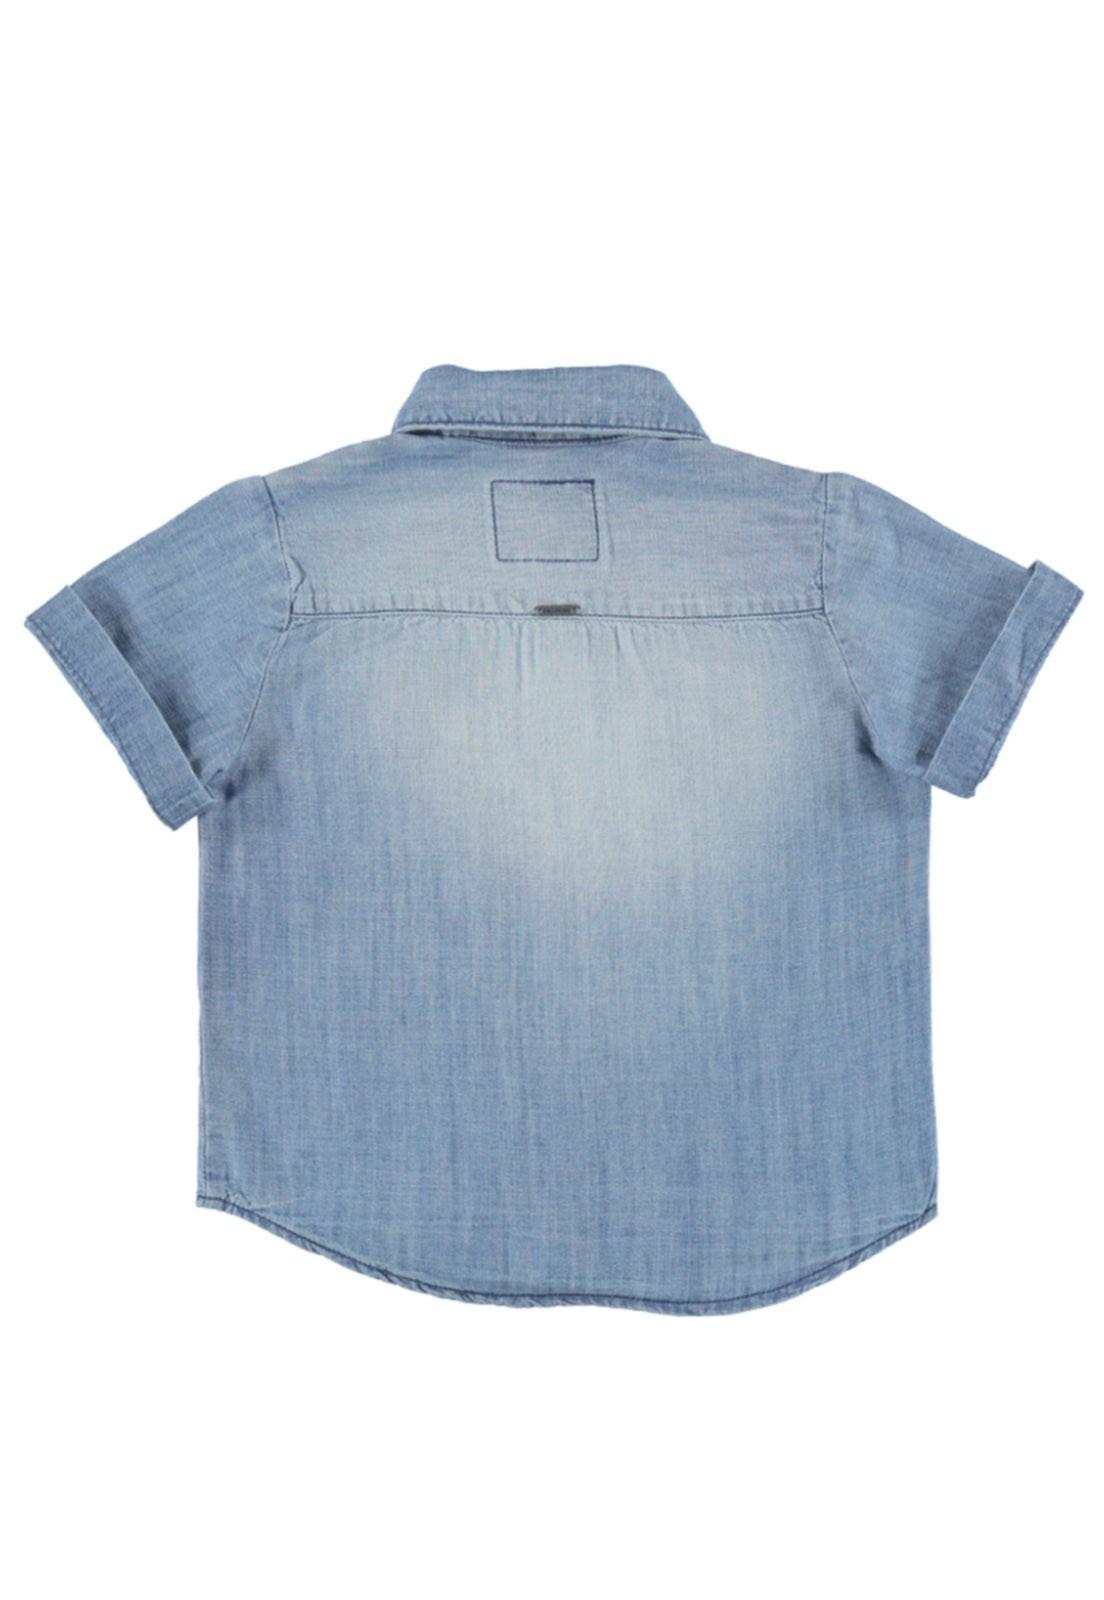 Camisa Crawling Jeans Baby Boy